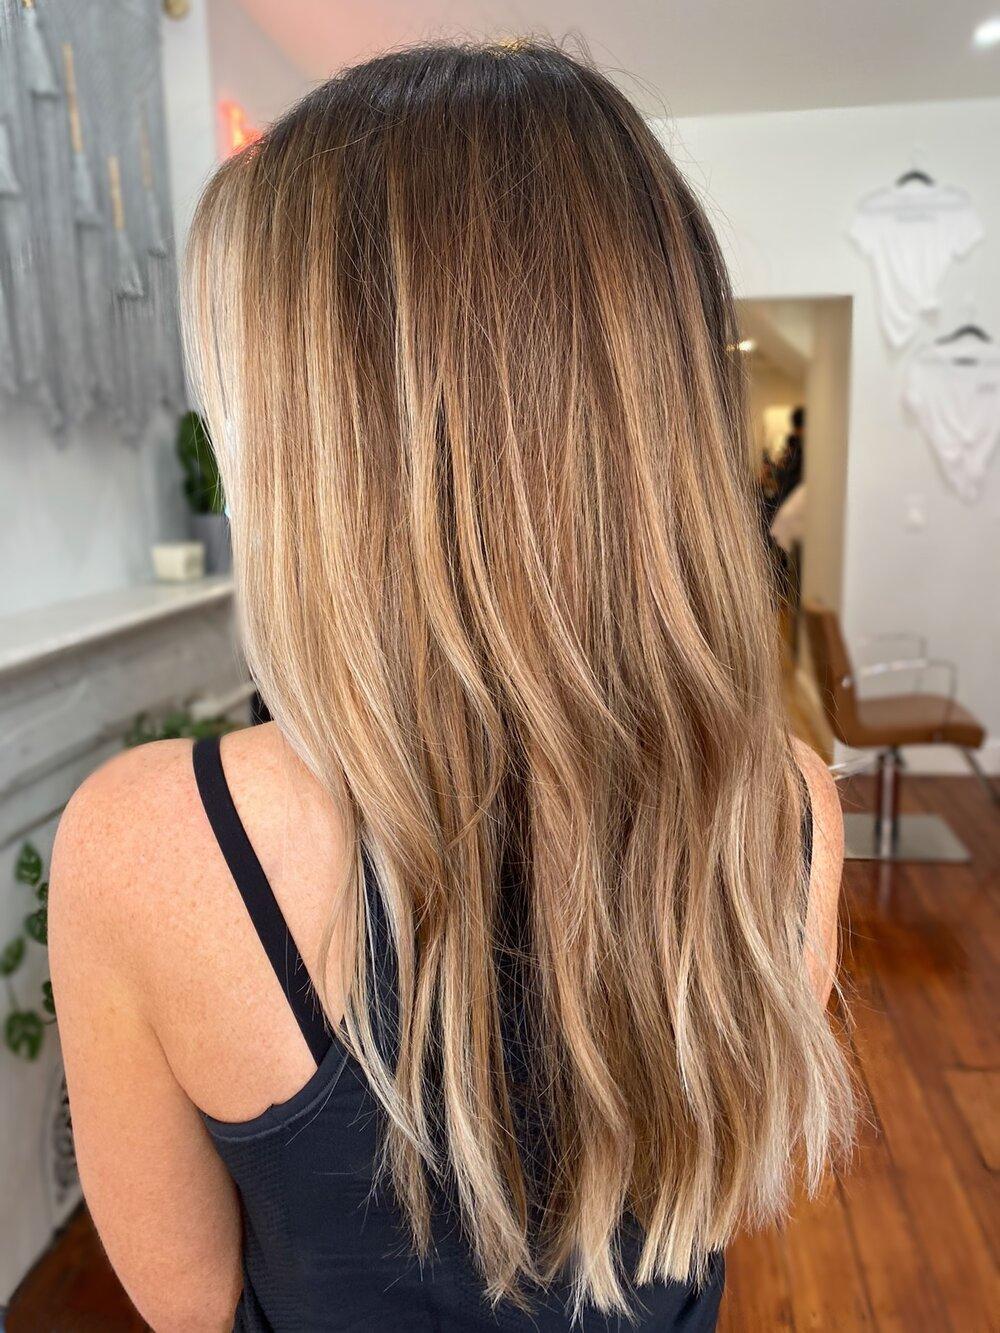 Gallery Phd Philadelphia Hair Design